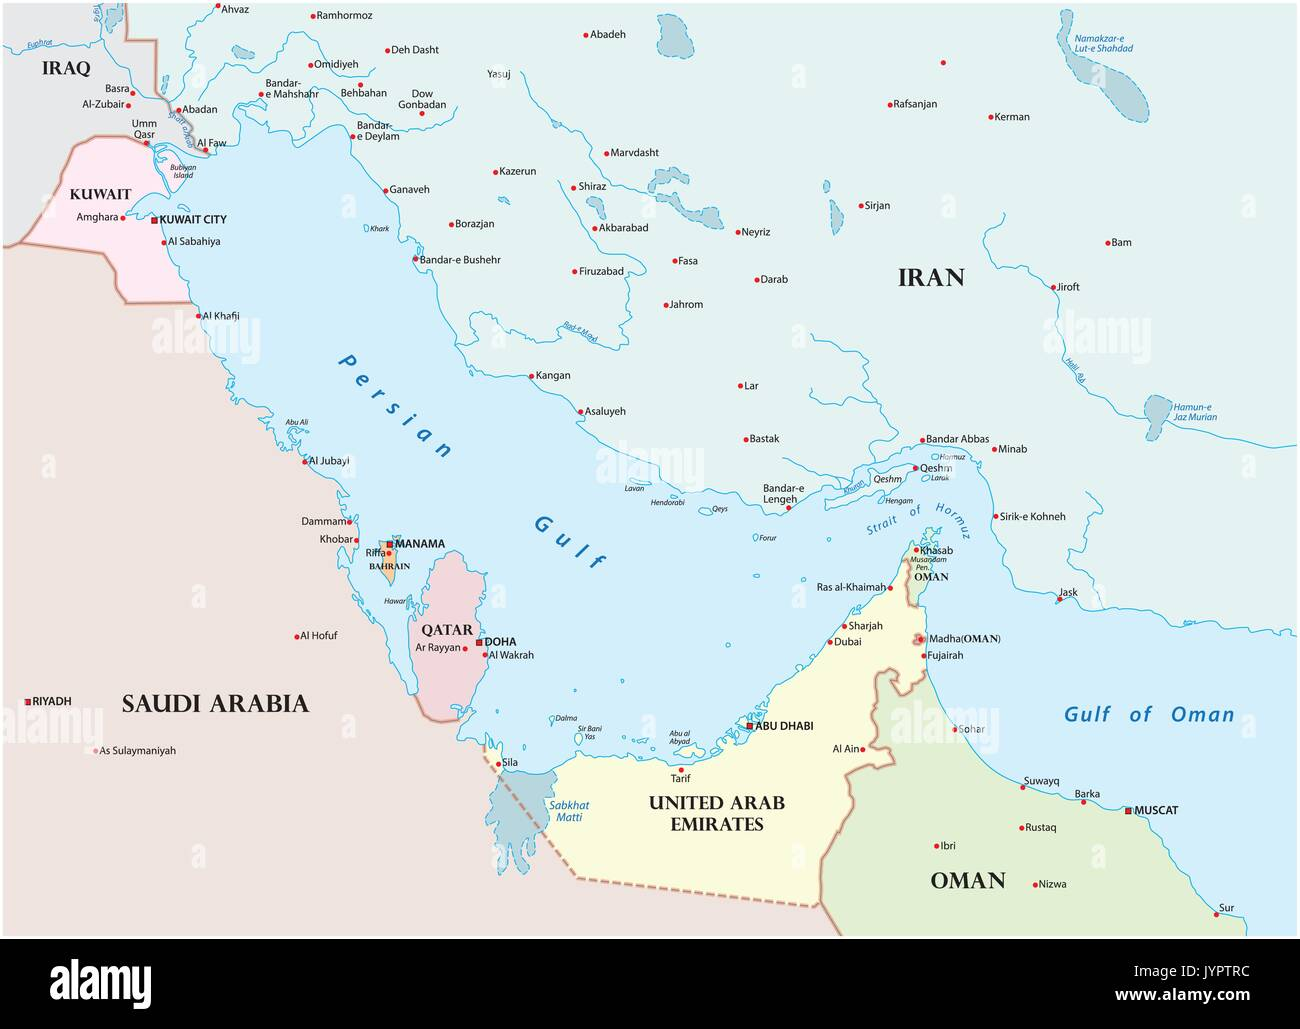 Persian Gulf Map Stock Photos & Persian Gulf Map Stock